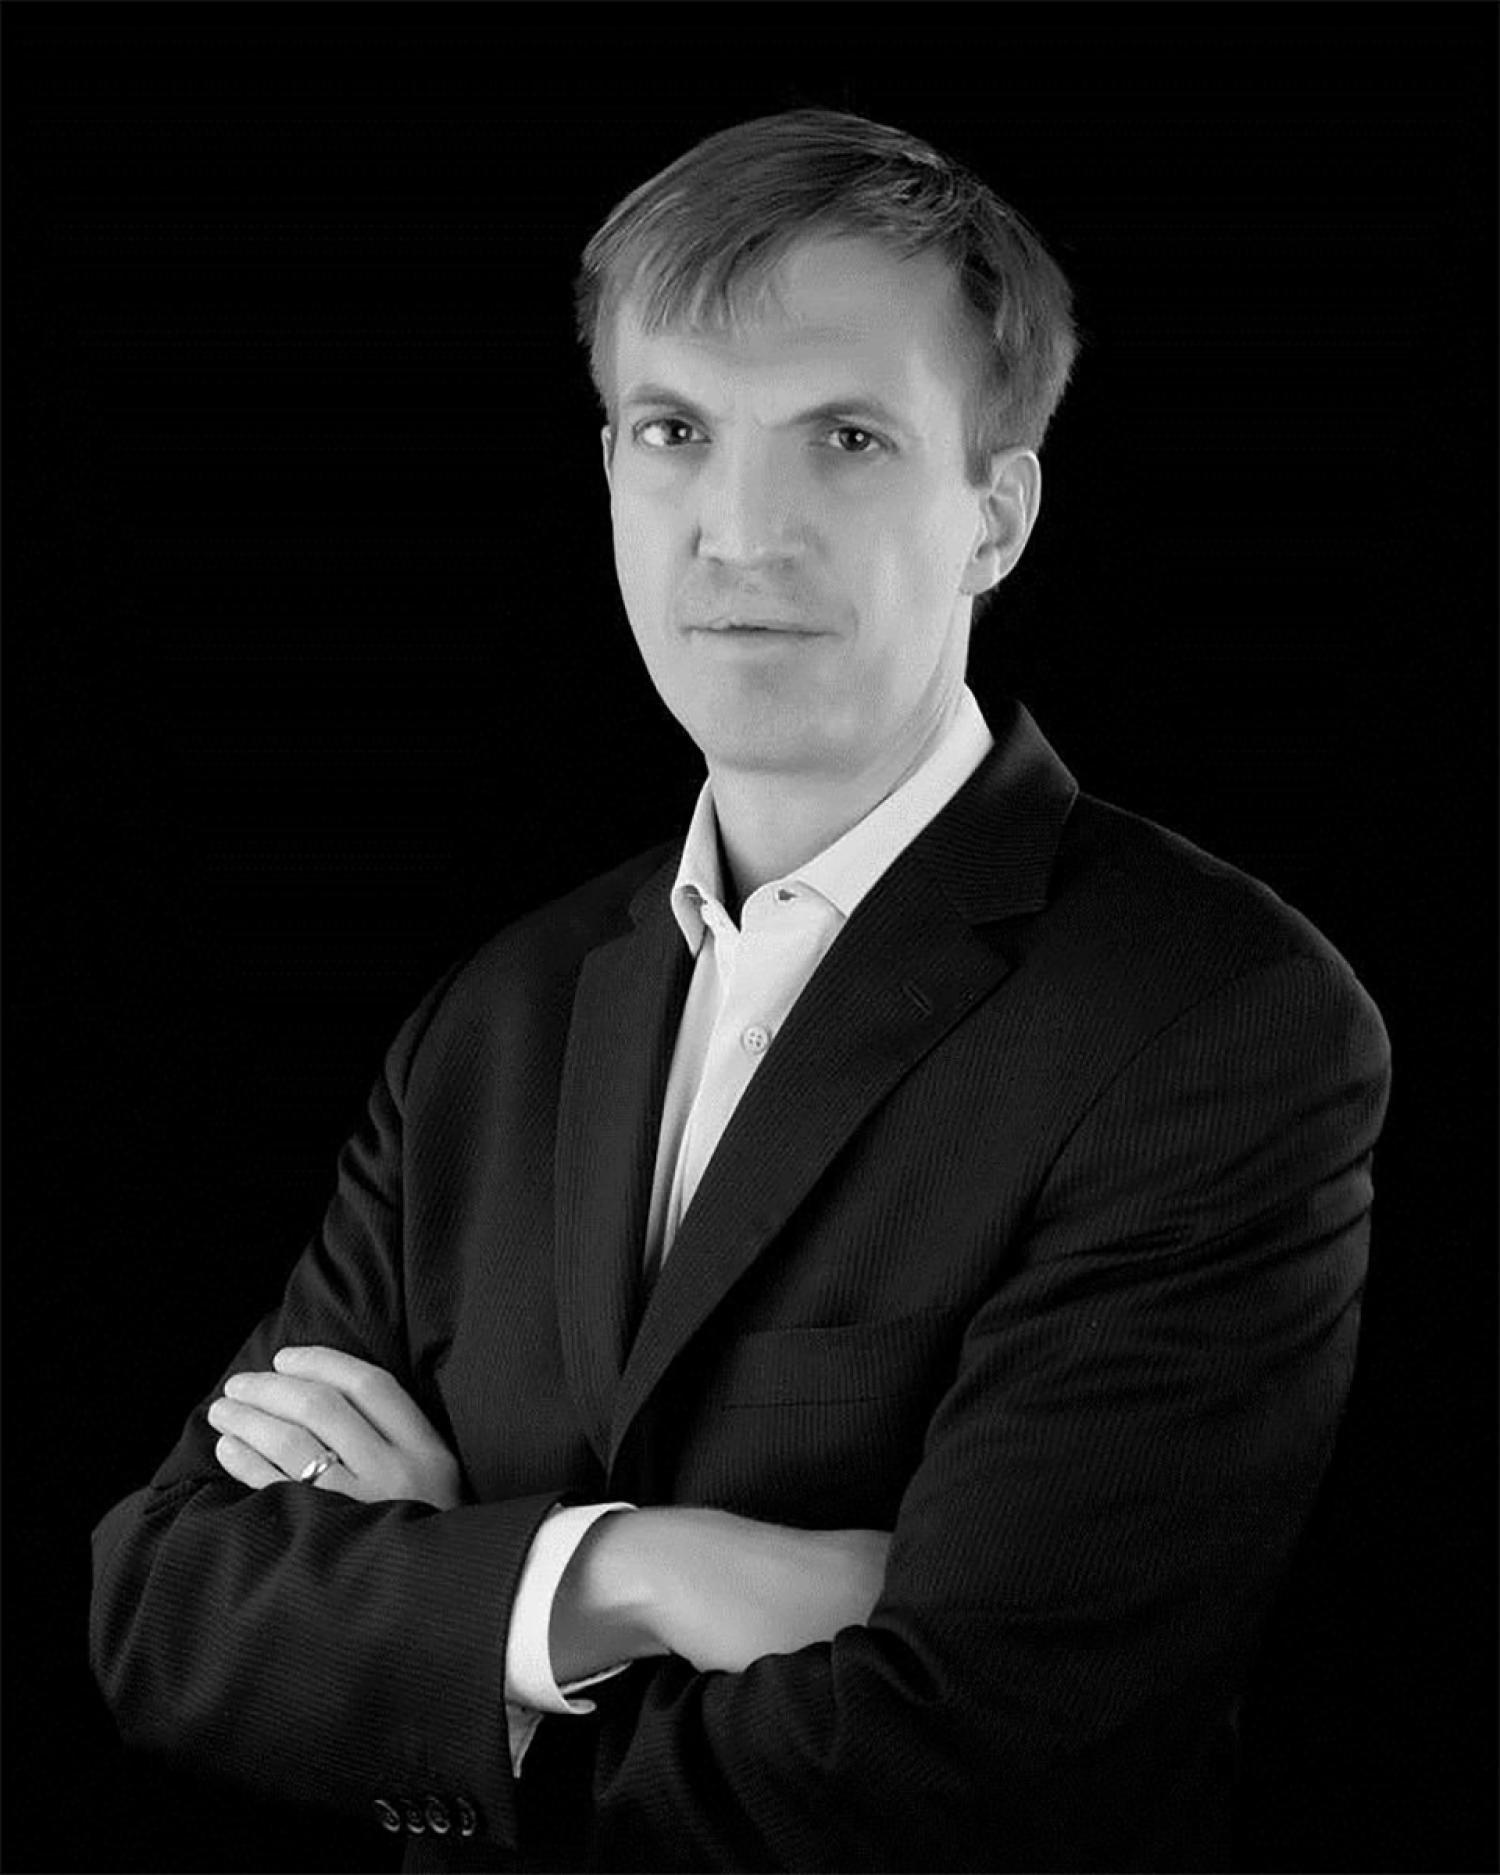 Erik Gerding